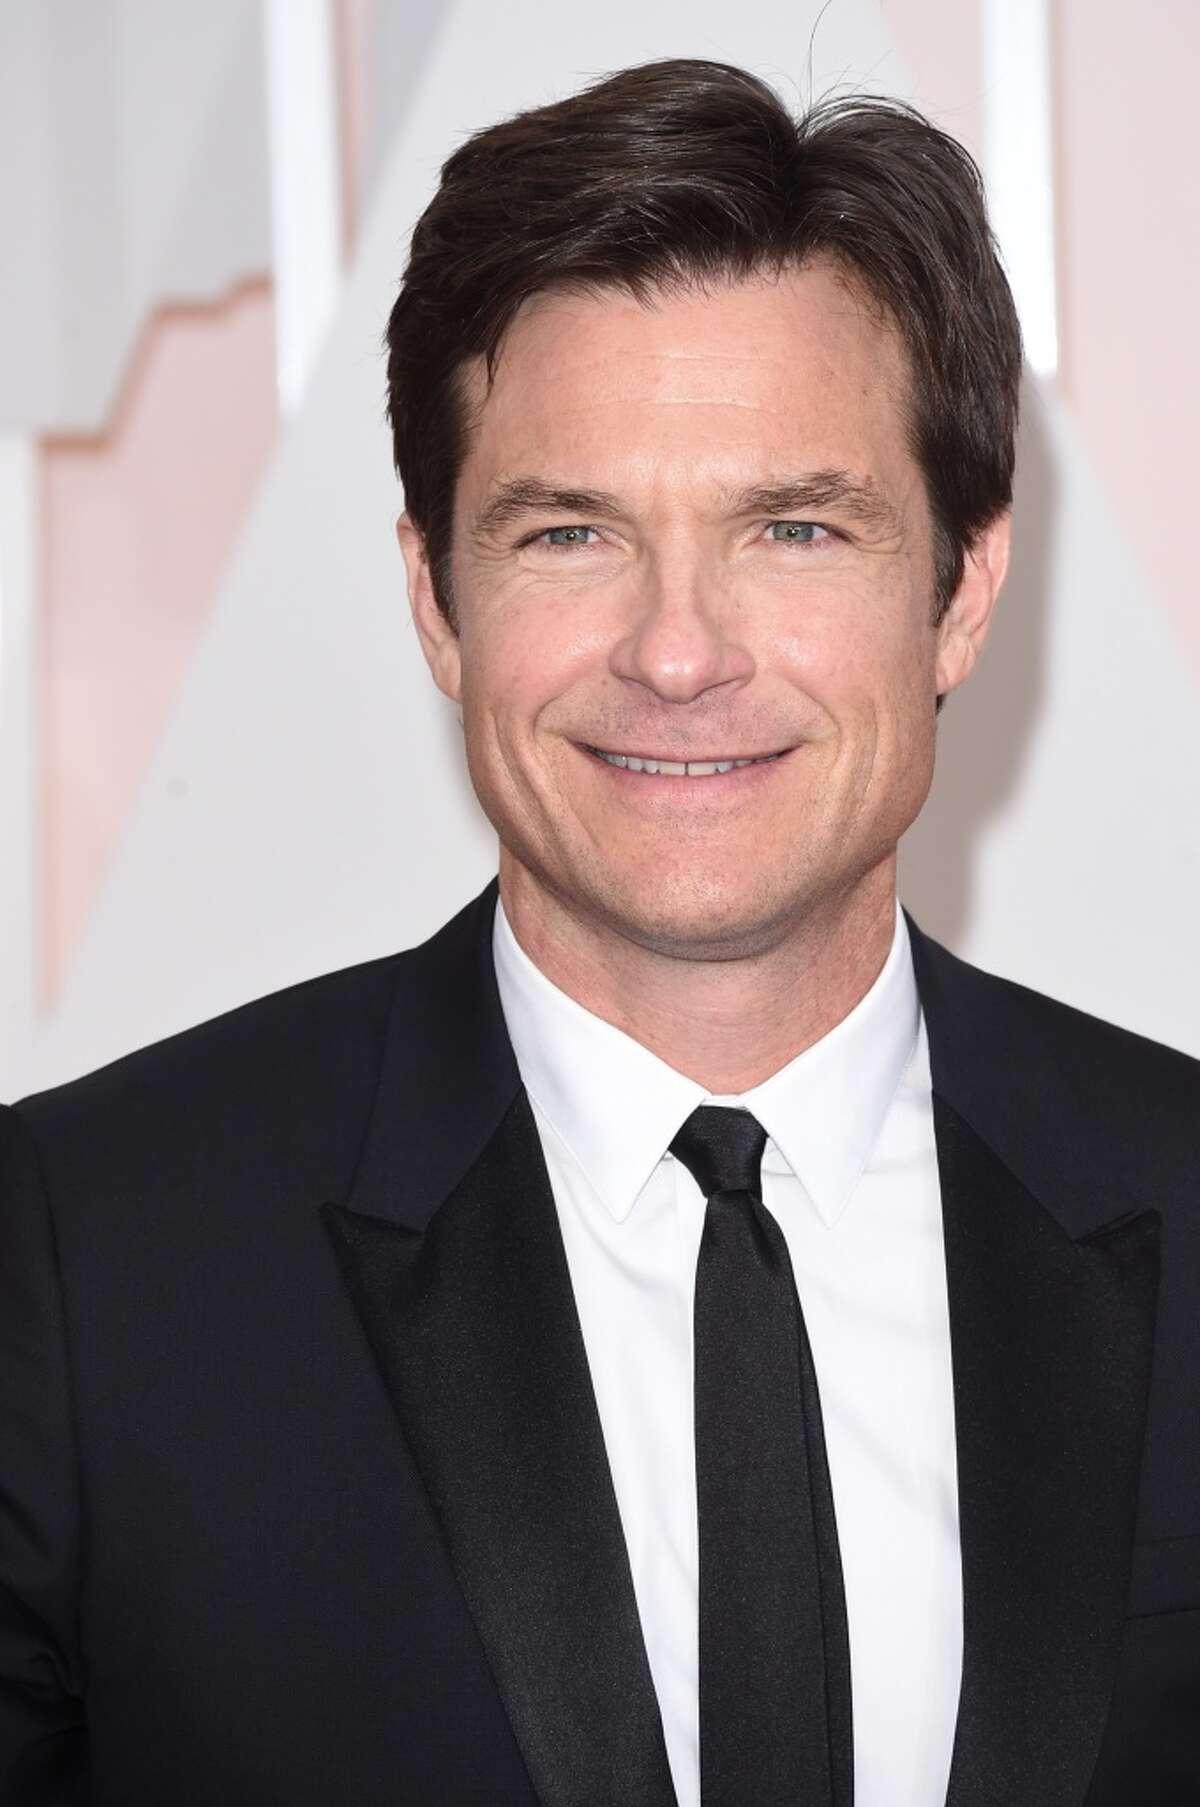 Jason Bateman, actor